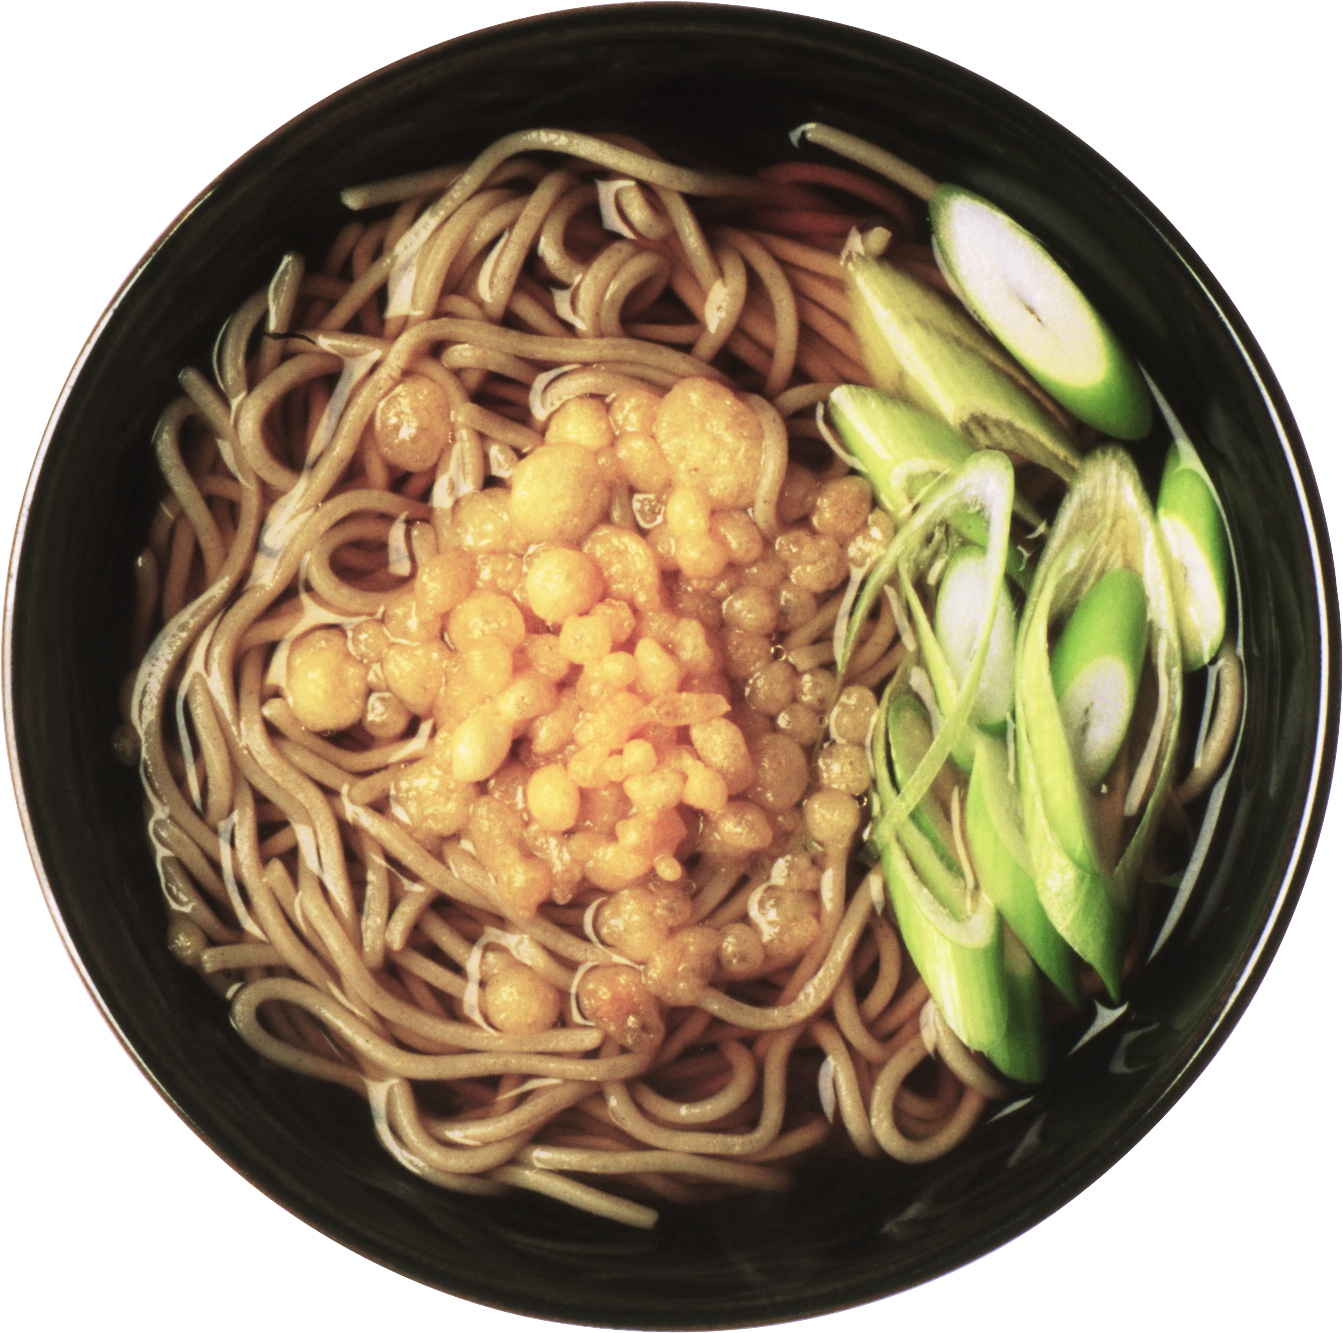 Noodle clipart hot noodle. Png images free download